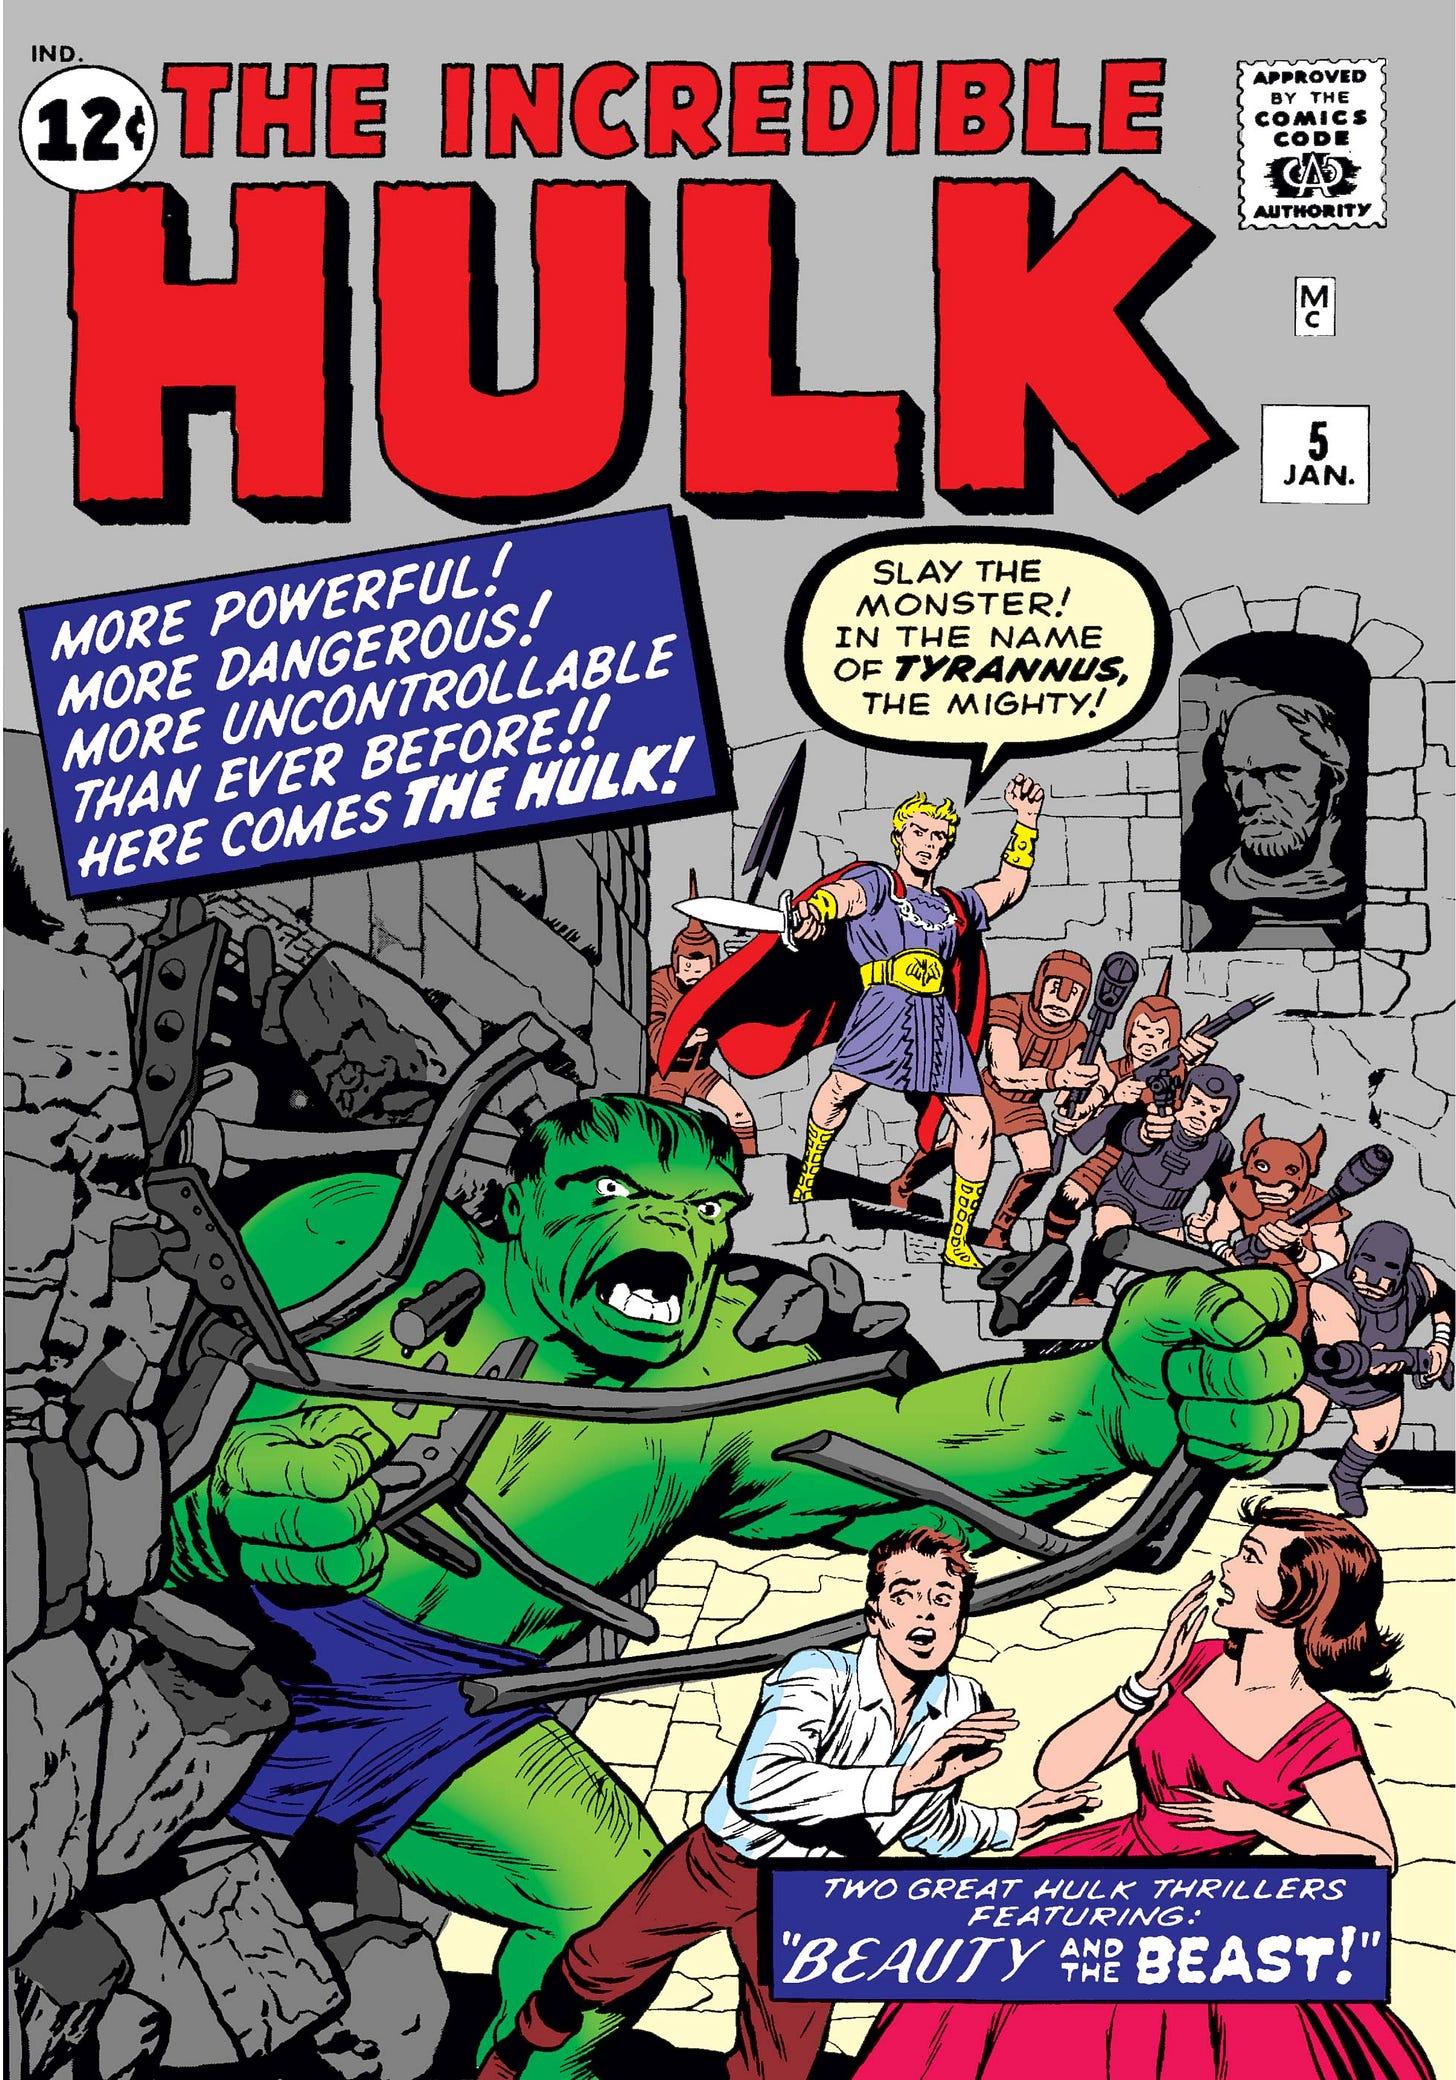 Incredible Hulk (1962) #5   Comic Issues   Marvel